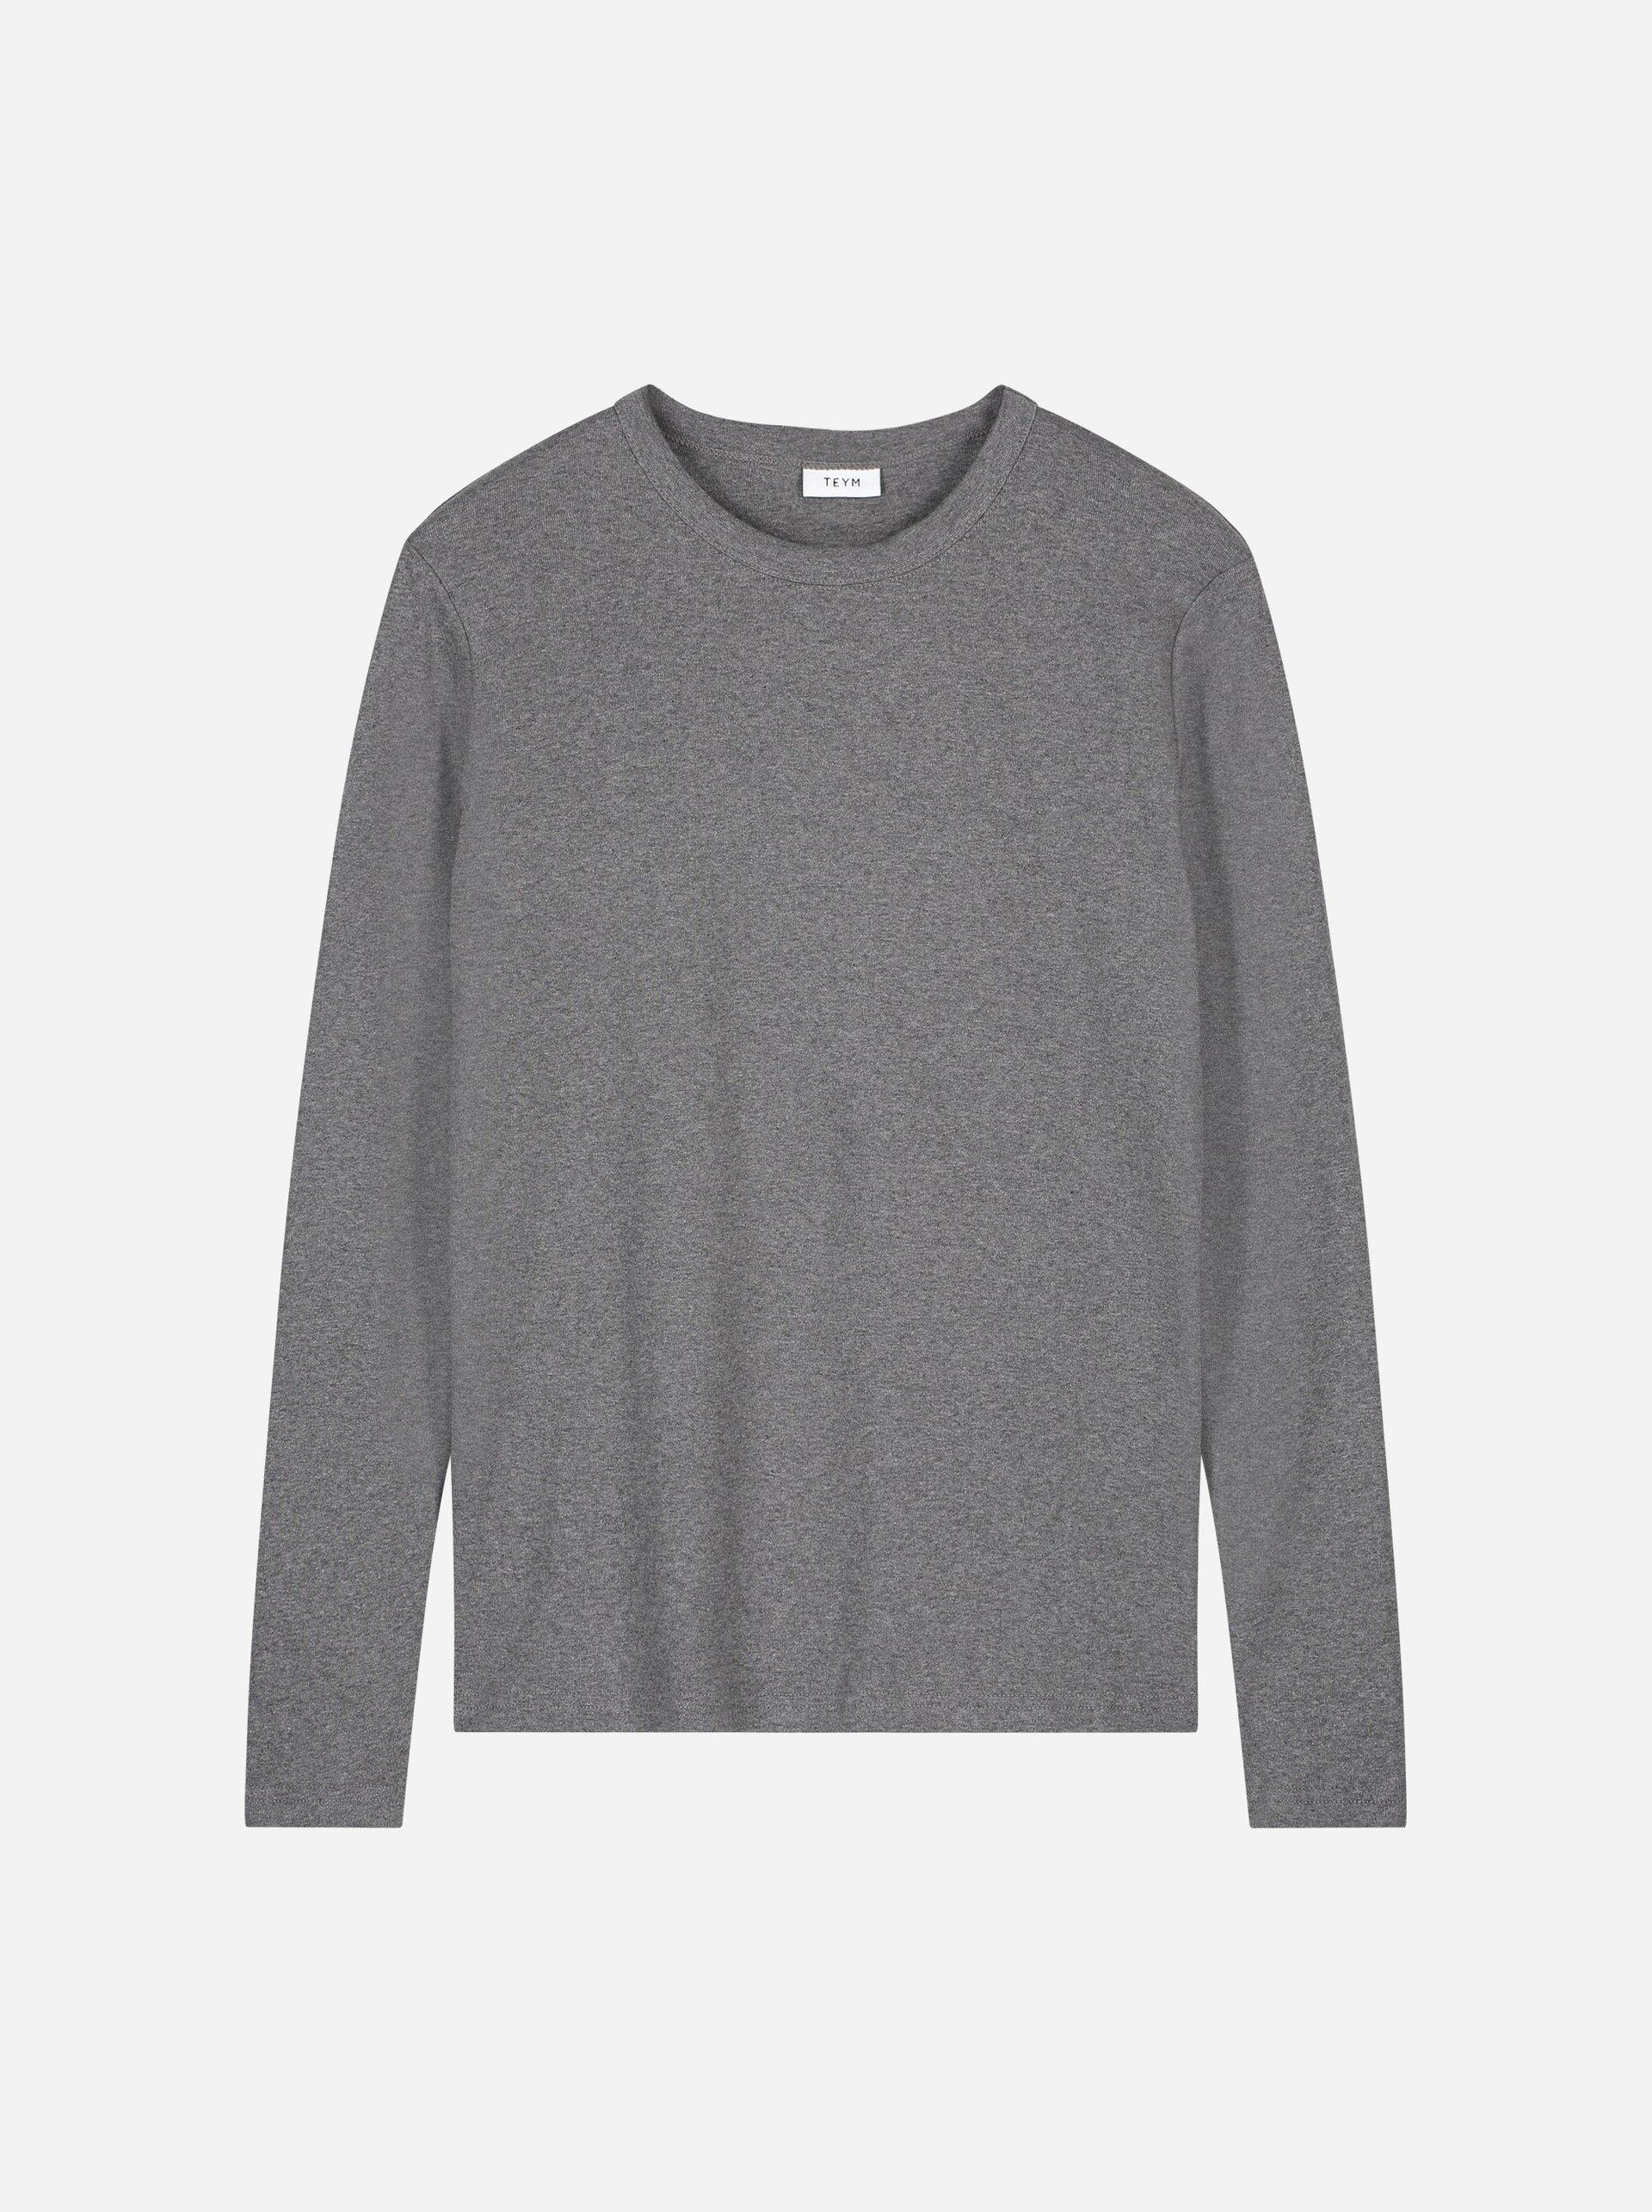 Teym - The-T-Shirt - Longsleeve - Women - Melange Grey - 4B